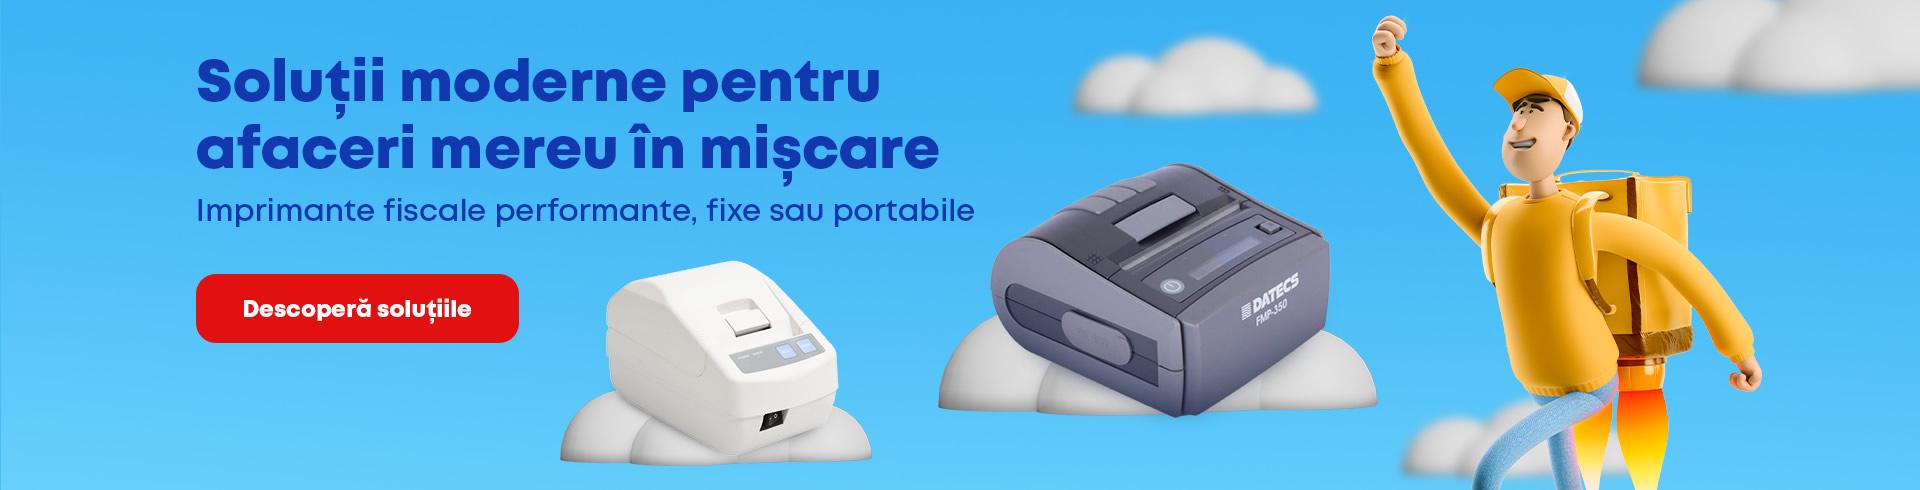 Slider imprimante fiscale datecs desktop